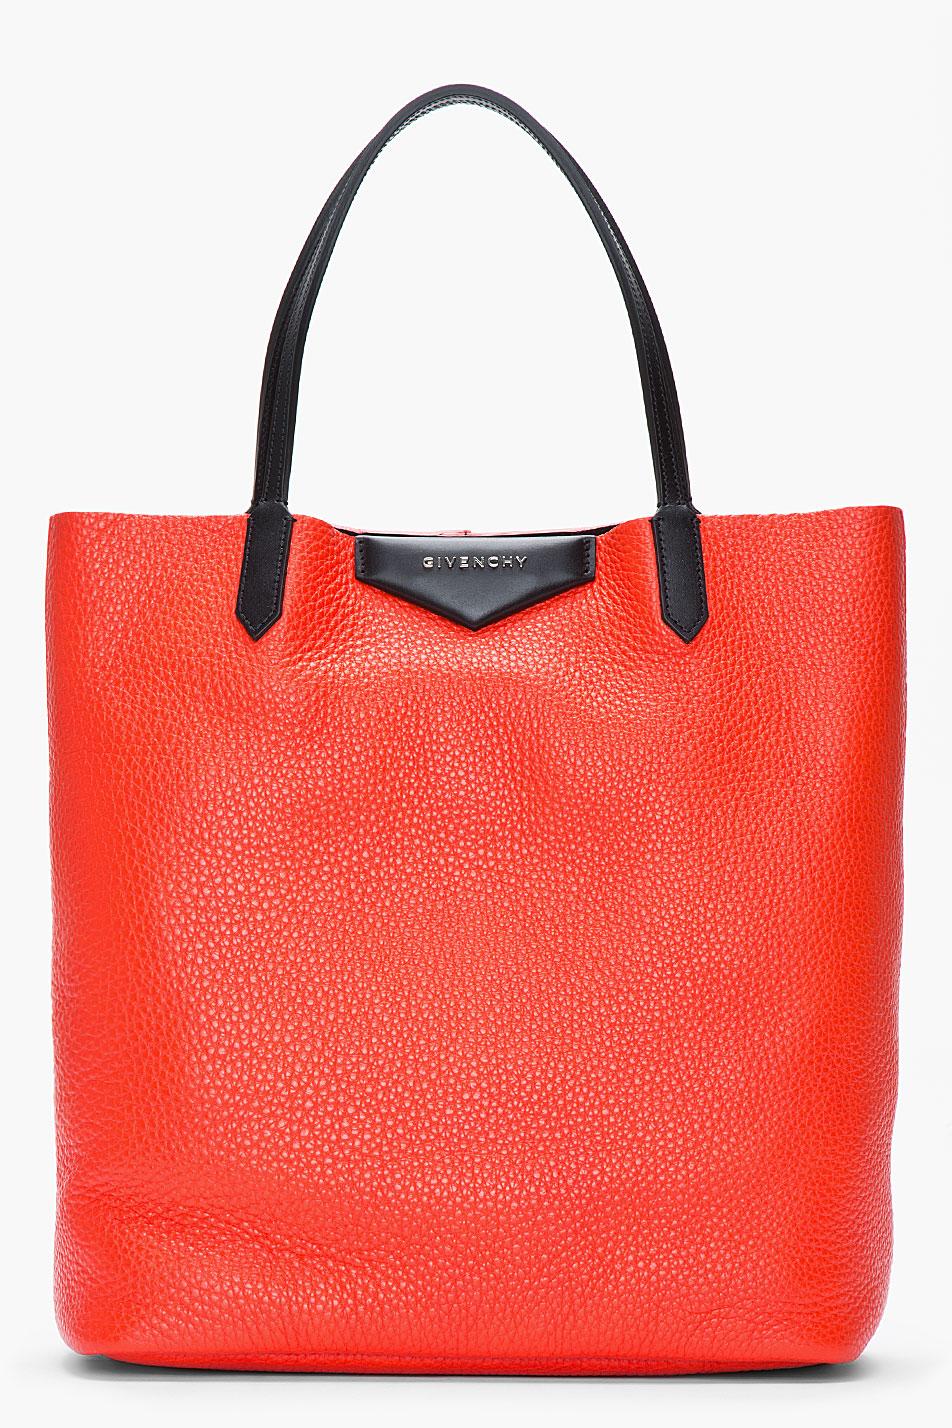 Lyst - Givenchy Poppy Red Pebbled Leather Vertical Antigona Shopper ... f06f7118441c